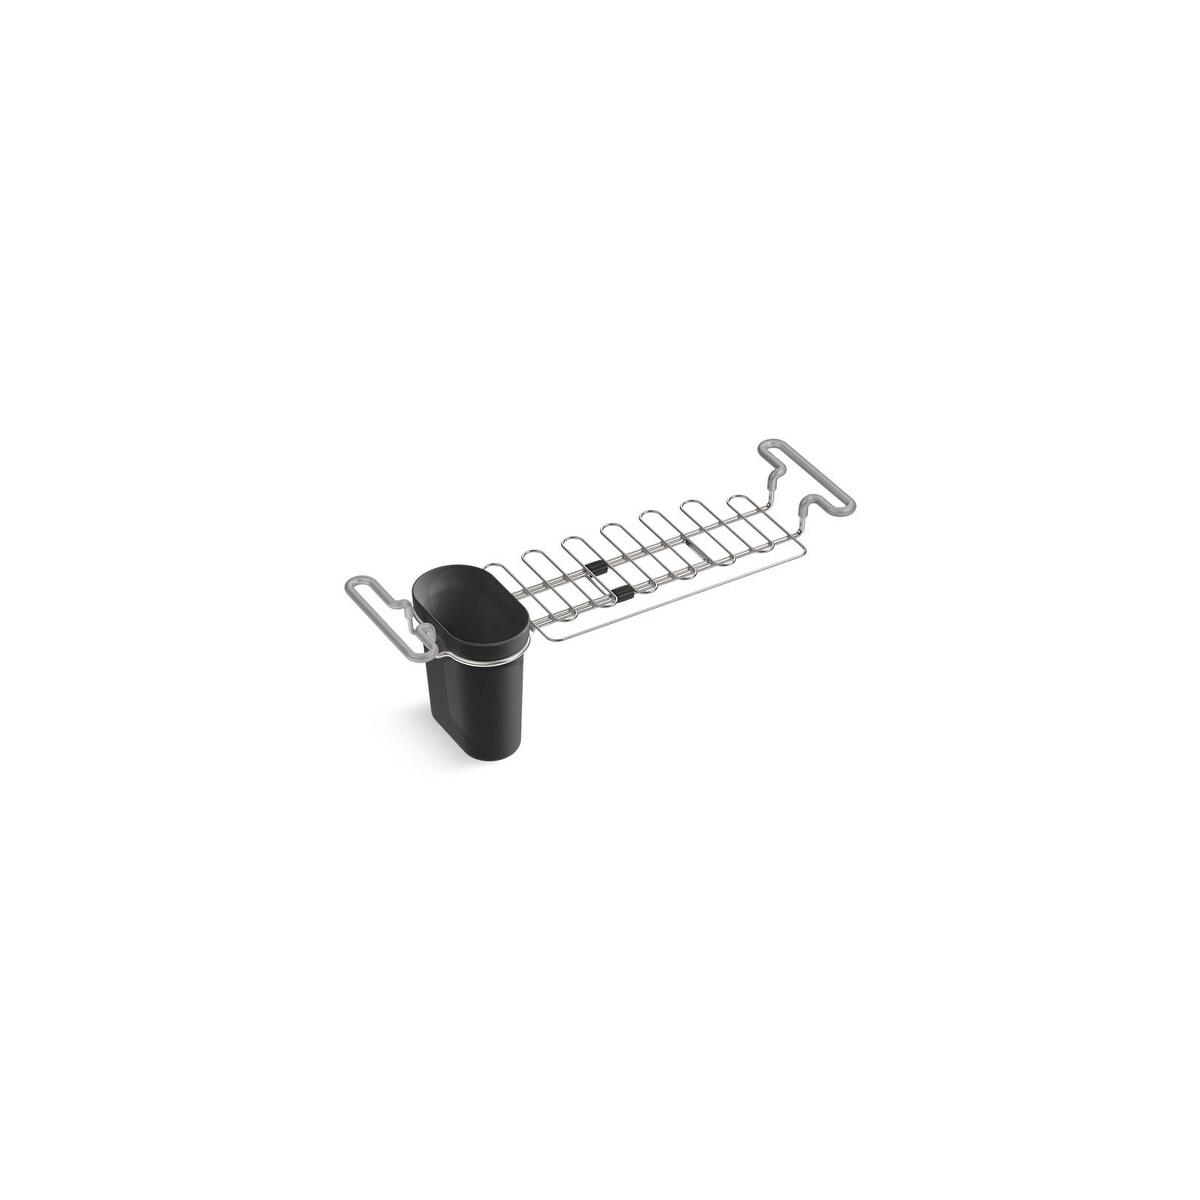 kohler stainless steel sink rack 12 1 4 x 13 3 4 for undertone r and verse tm kitchen sinks stainless steel k 3129 st